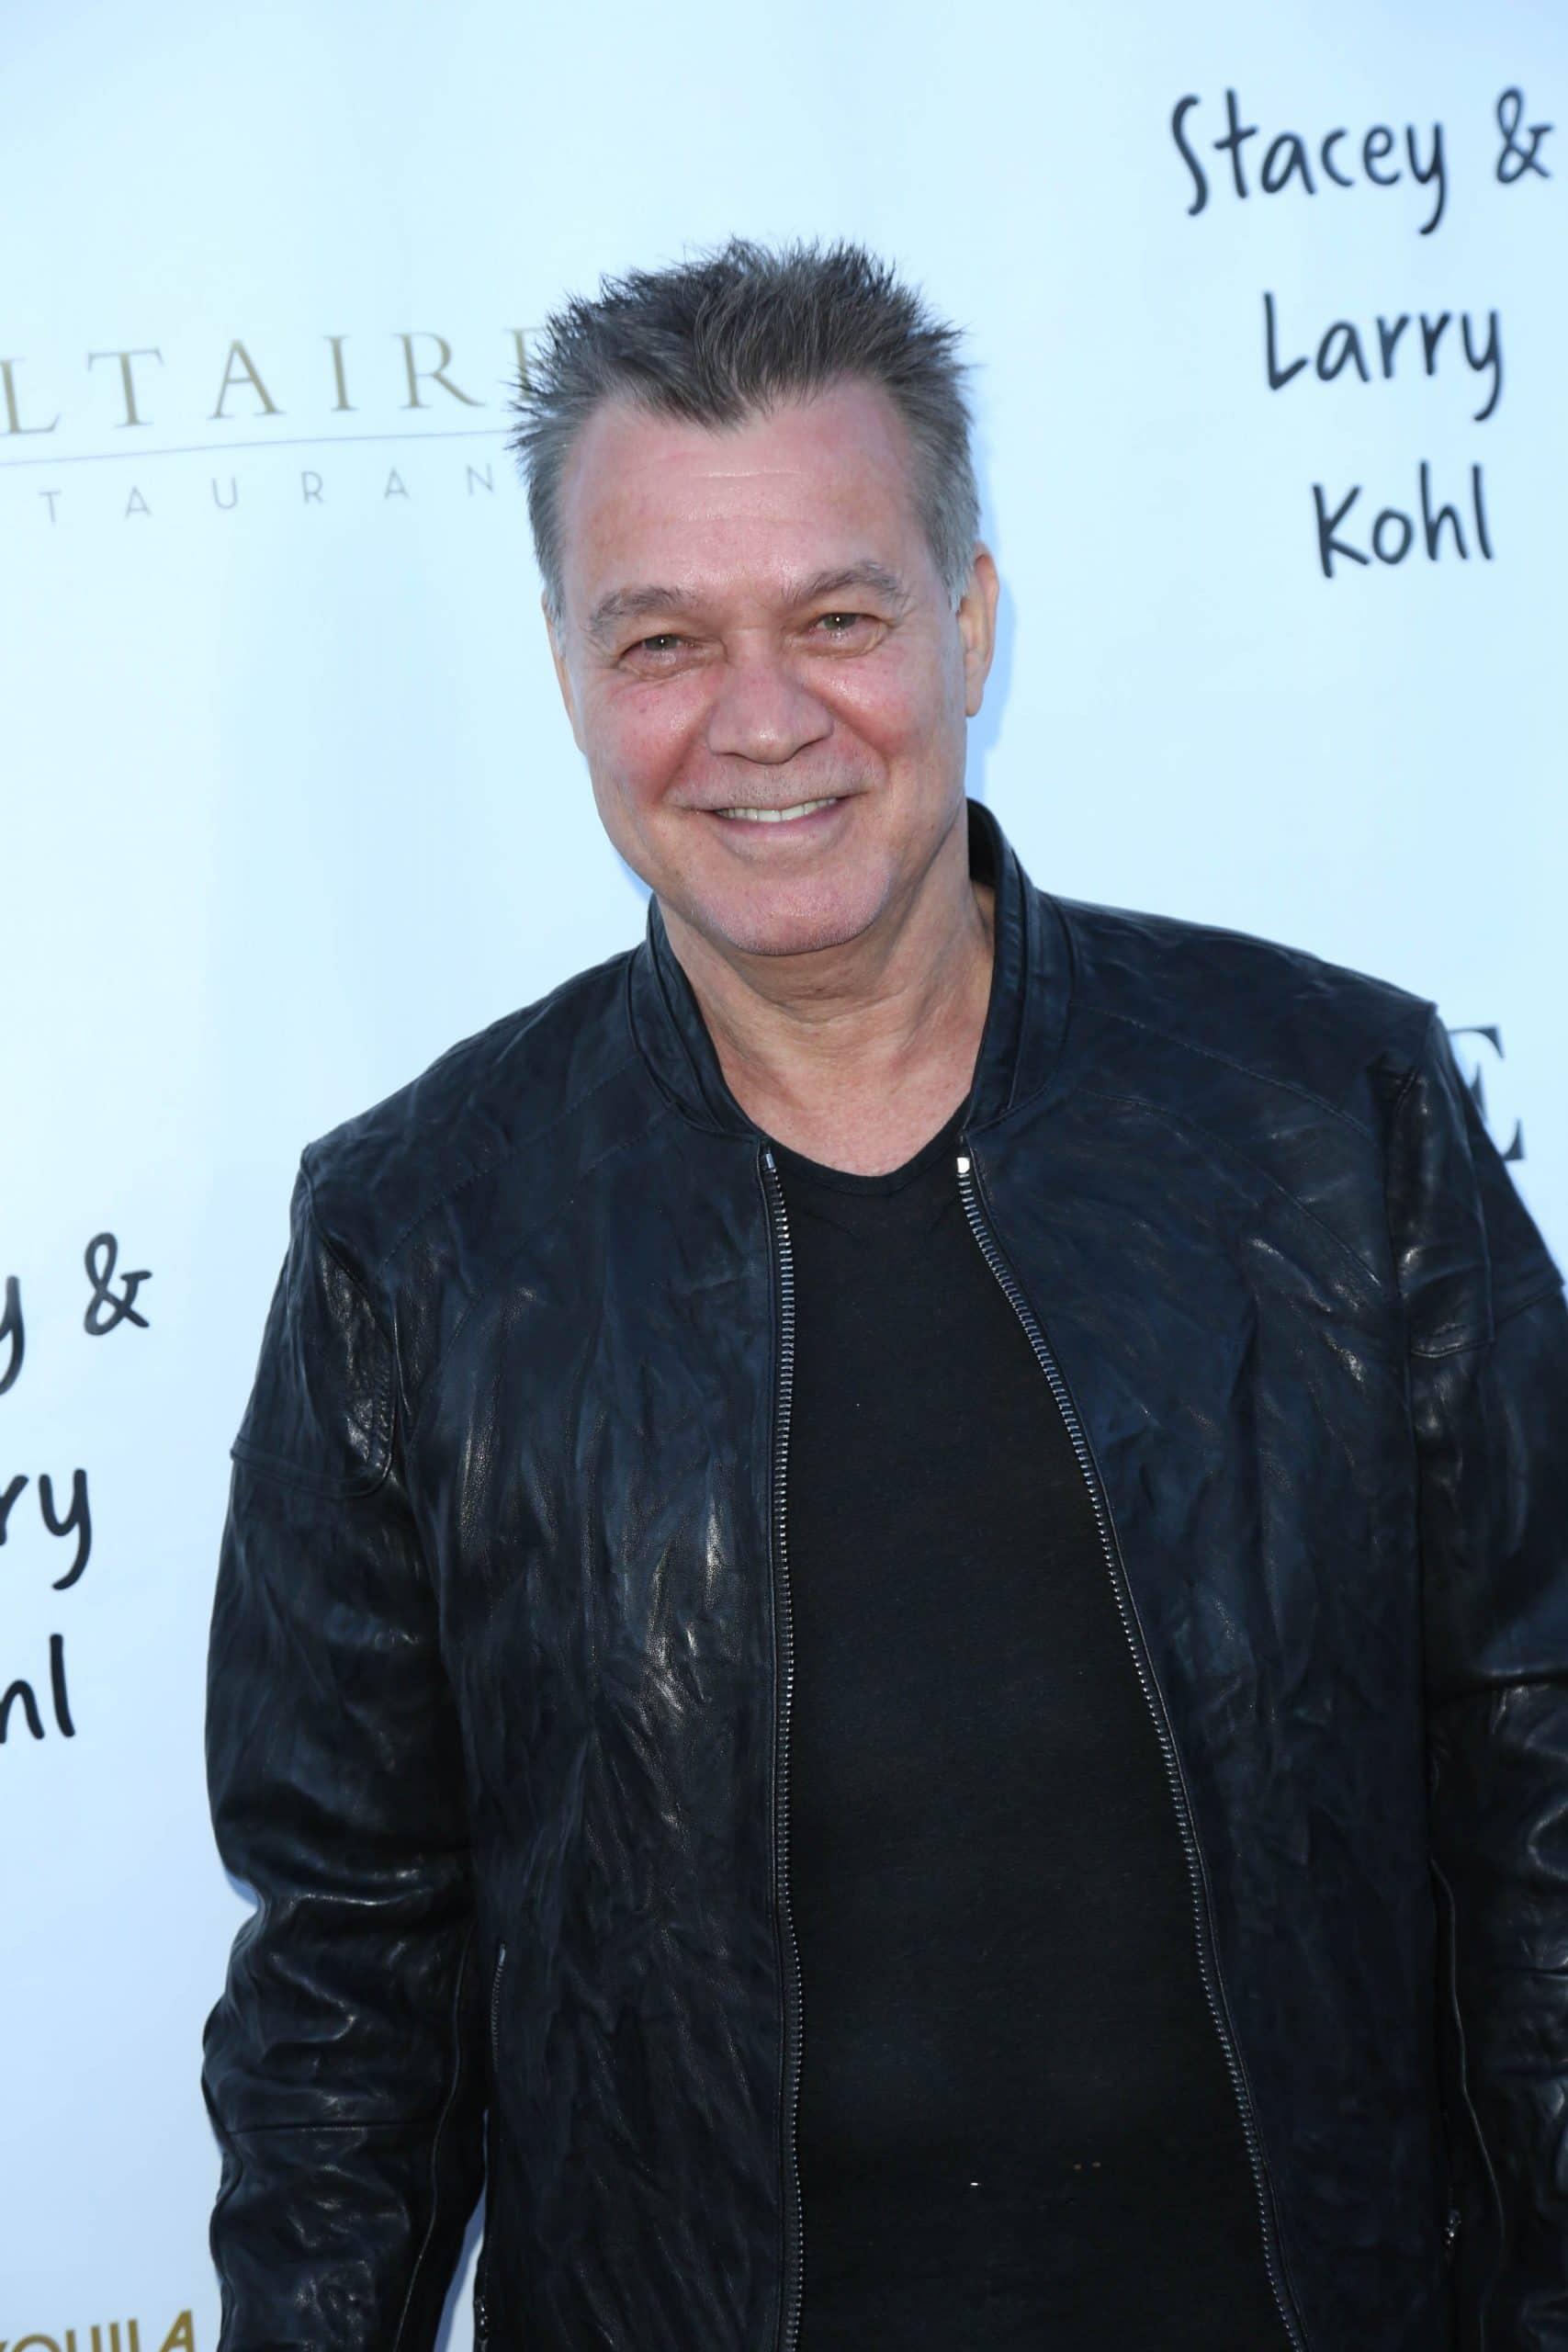 This Famous Guitarist Bought Eddie Van Halen His Very First Acoustic Guitar